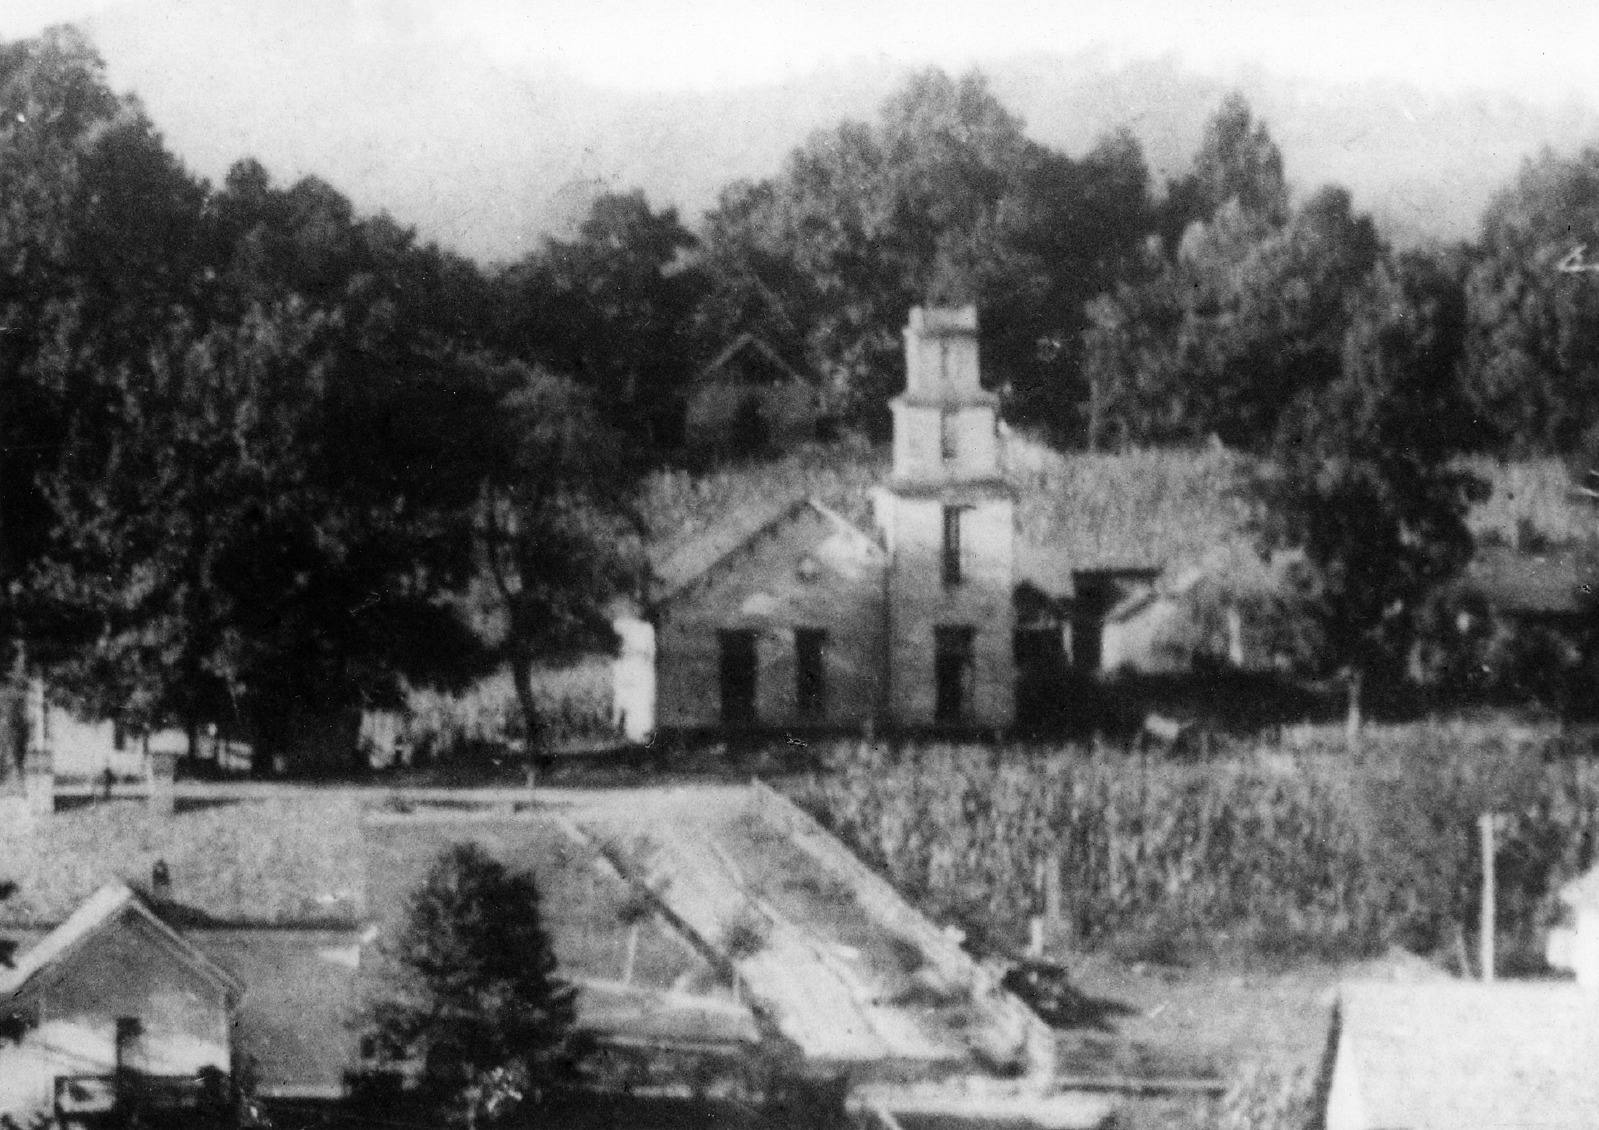 Mars Hill Baptist Church, 1887.